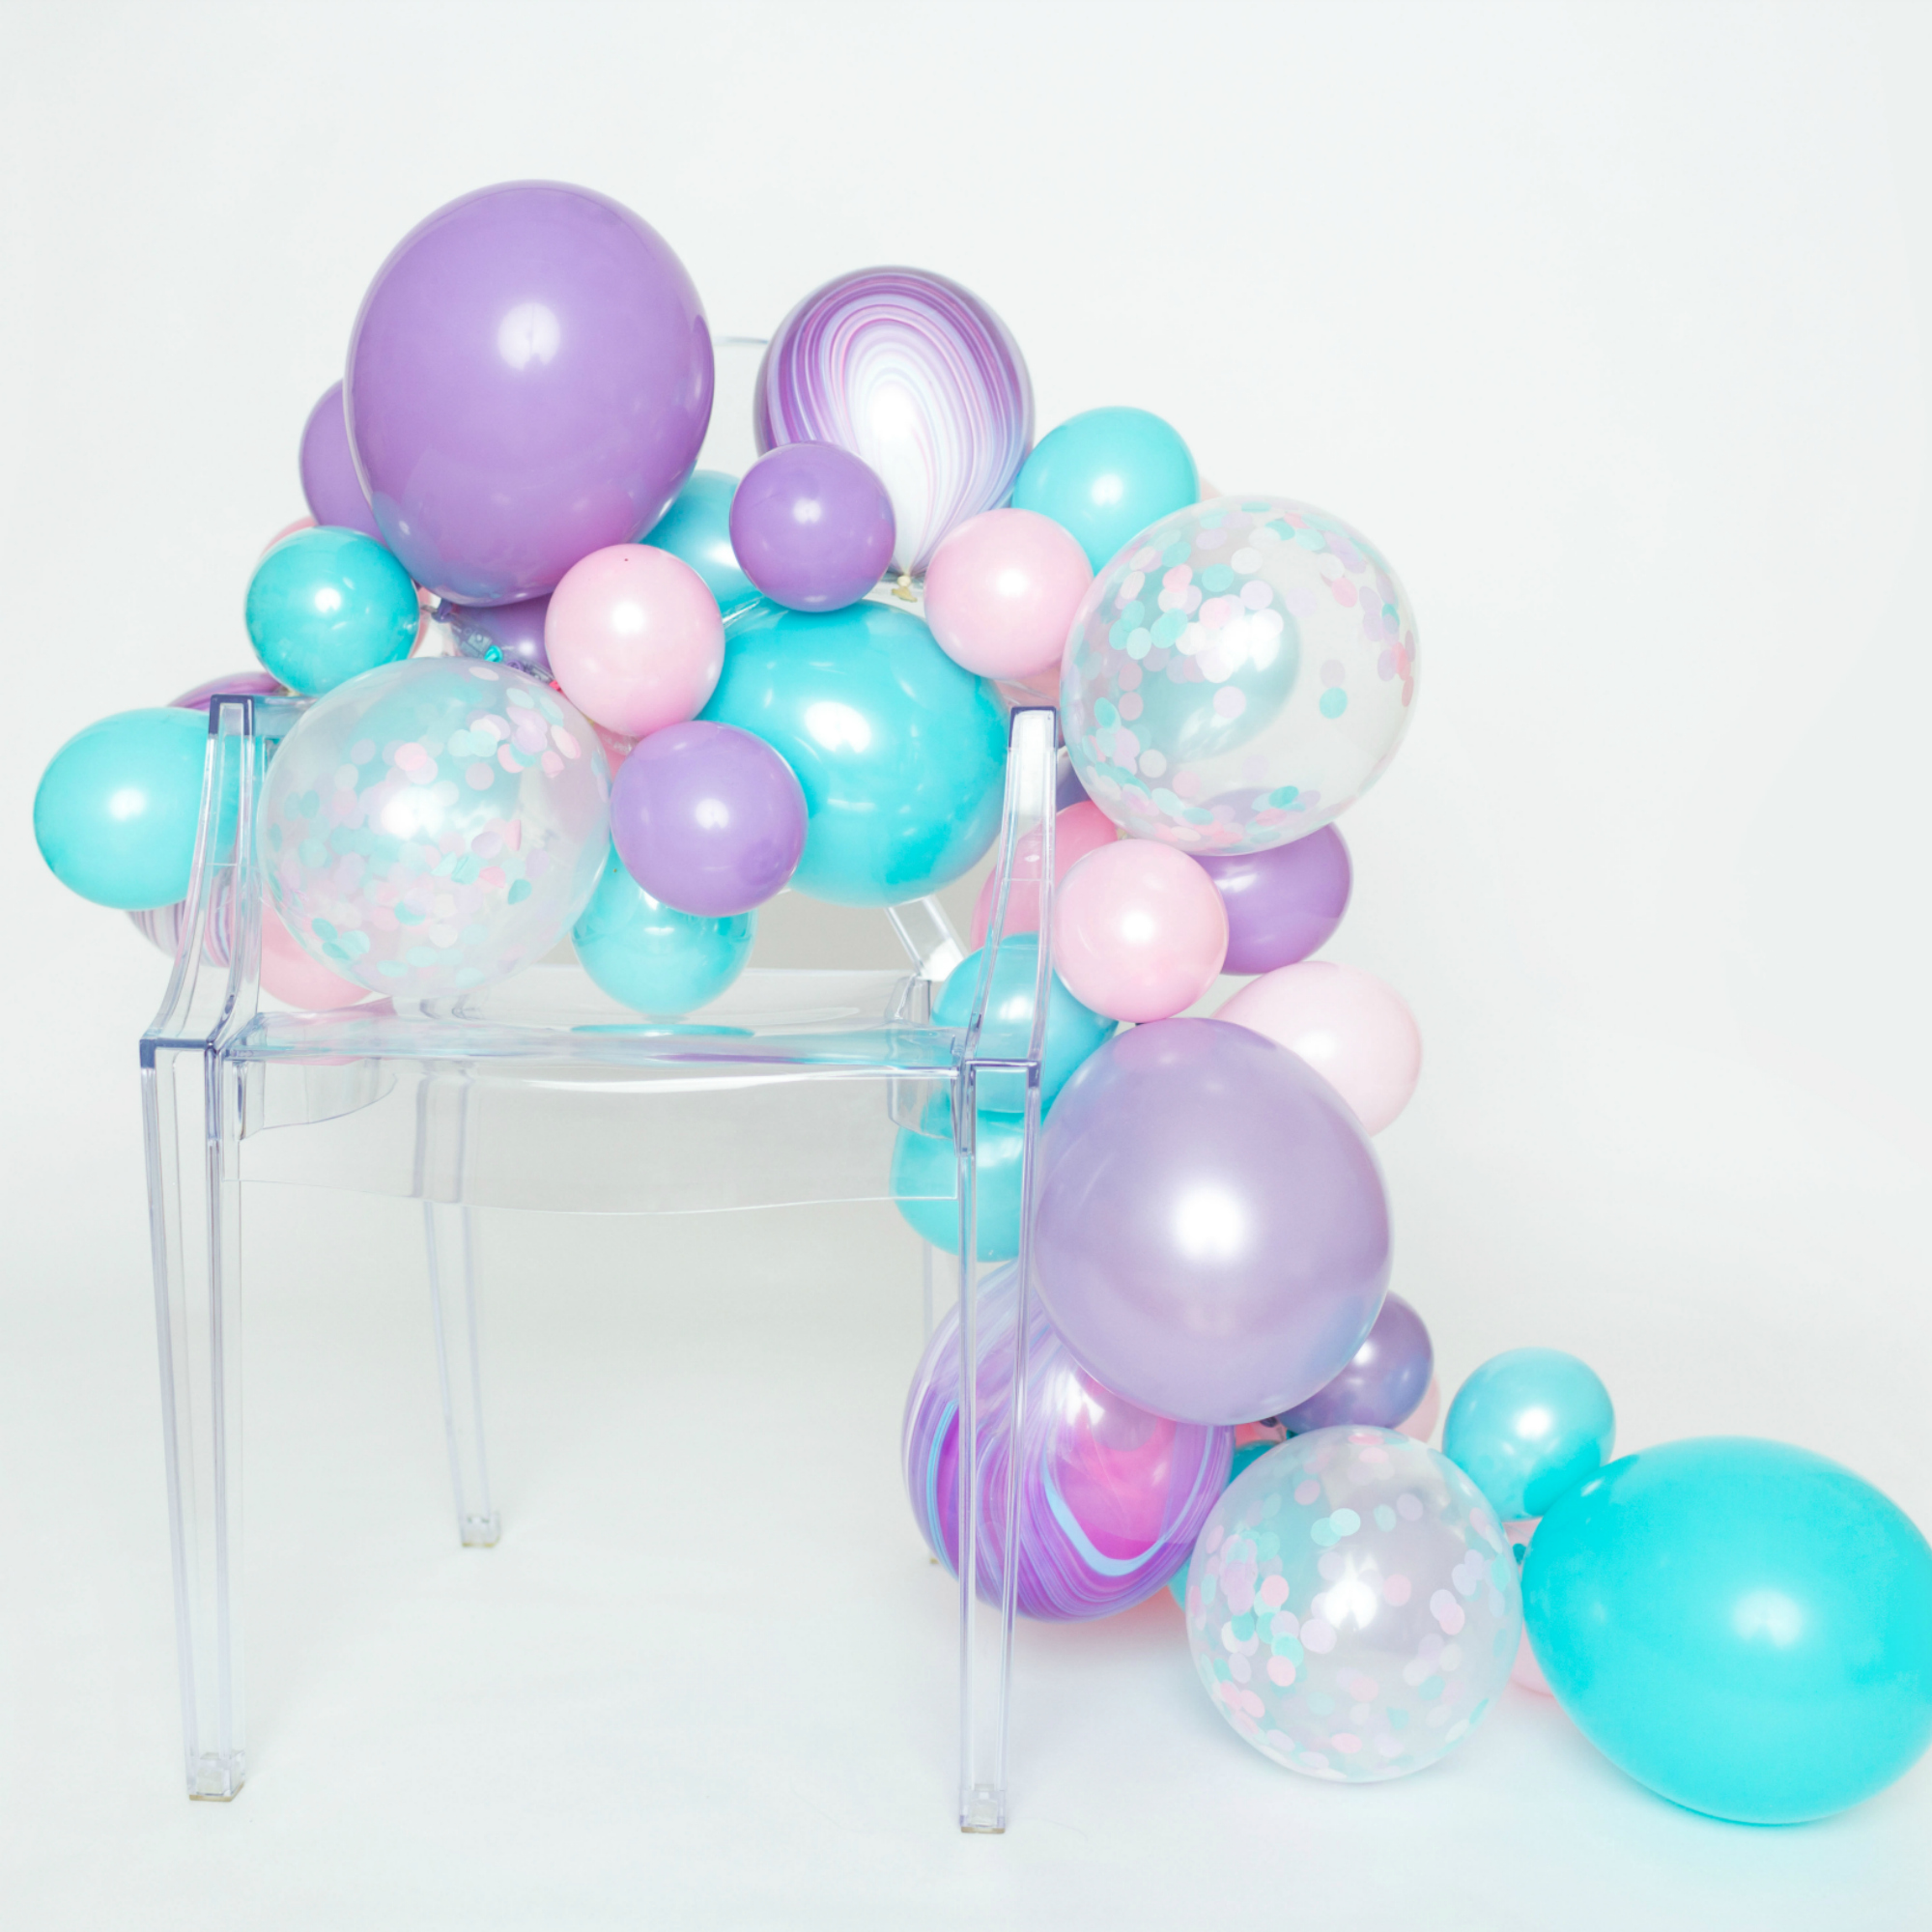 Diy Balloon Garland Kit Cotton Candy